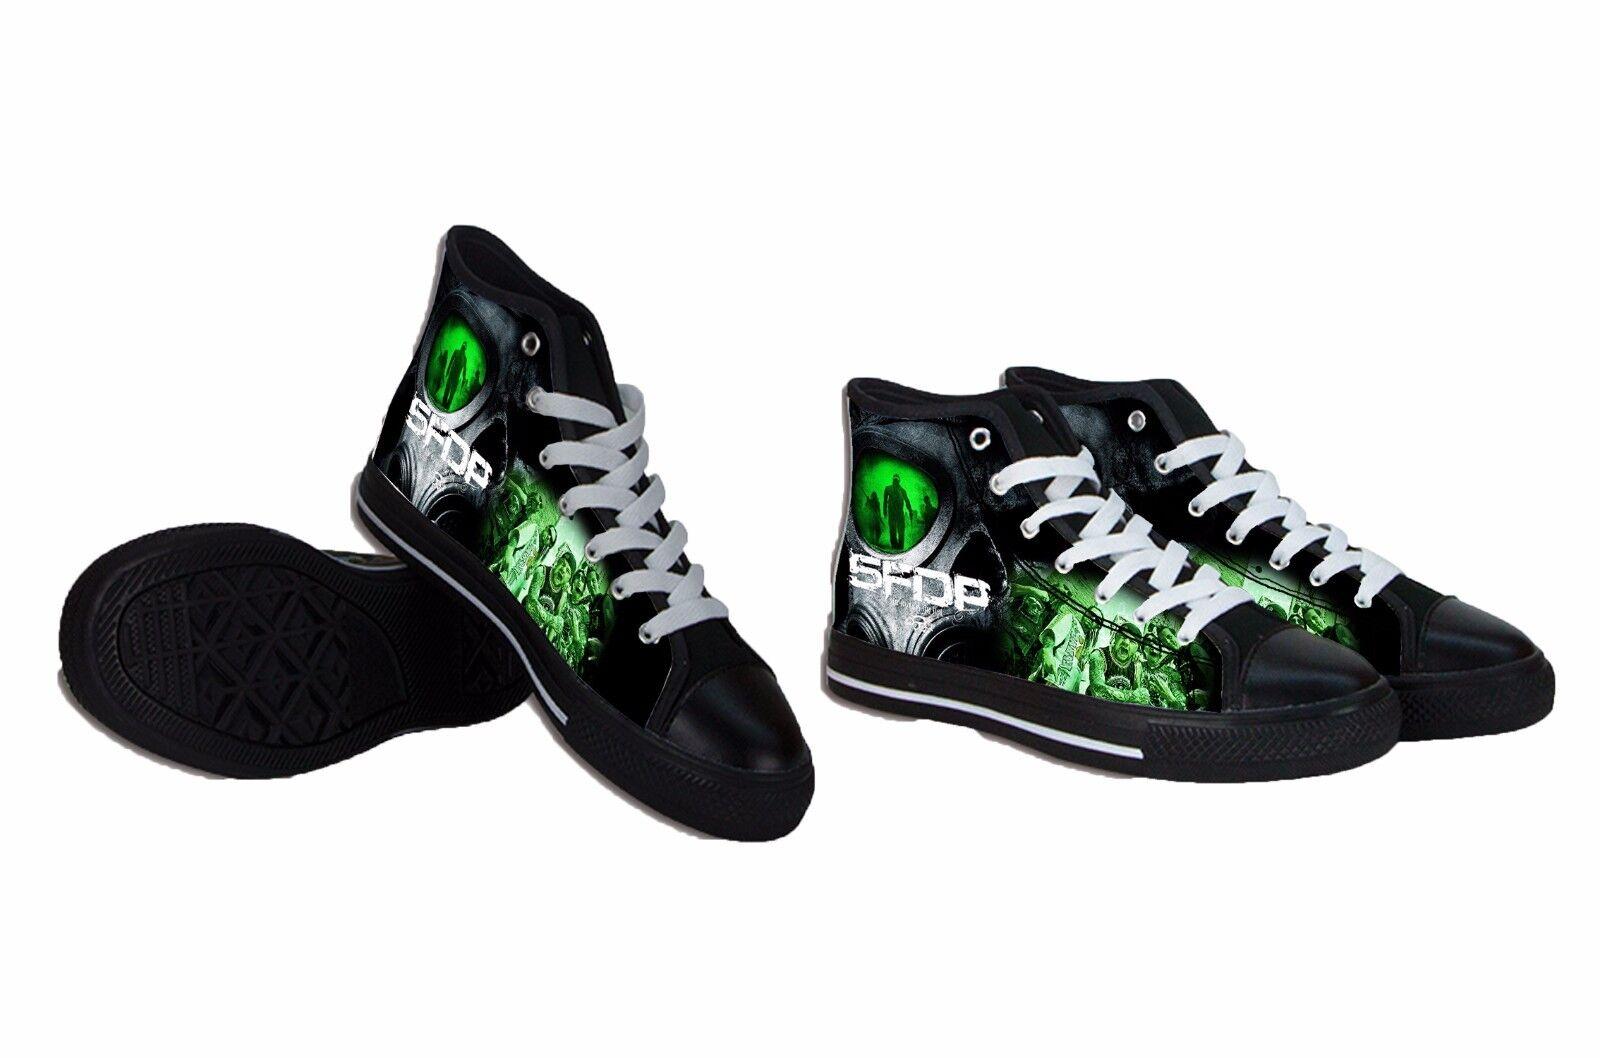 NEW Unique Five Finger Death Punch METAL BAND Canvas Mens Shoes RARE ITEMS